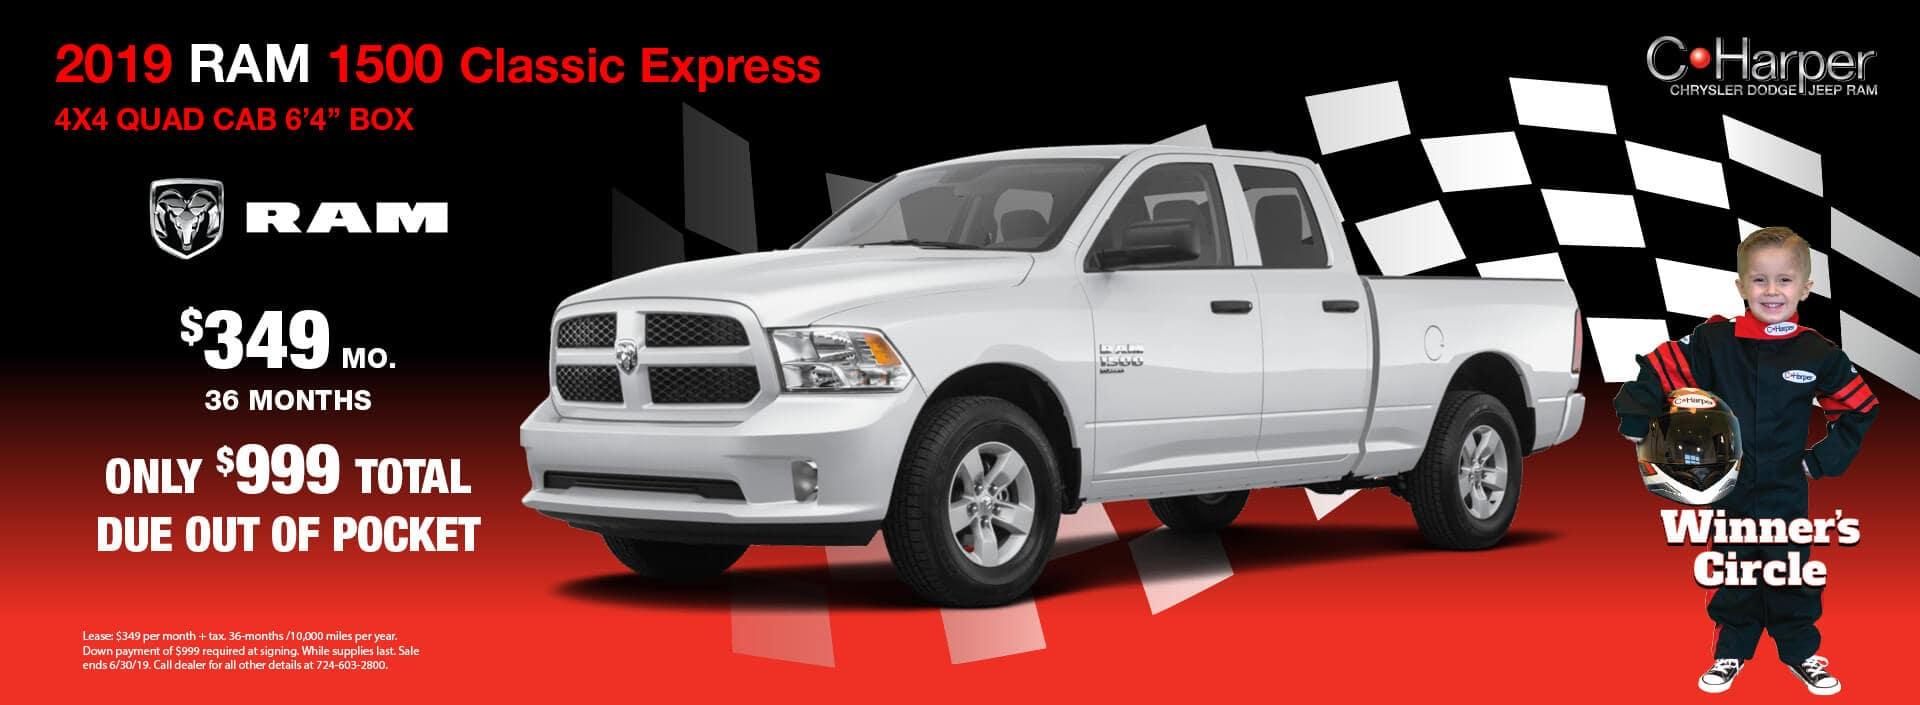 "2019 Ram 1500 Classic Express 4X$ Quad Cab 6' 4"""